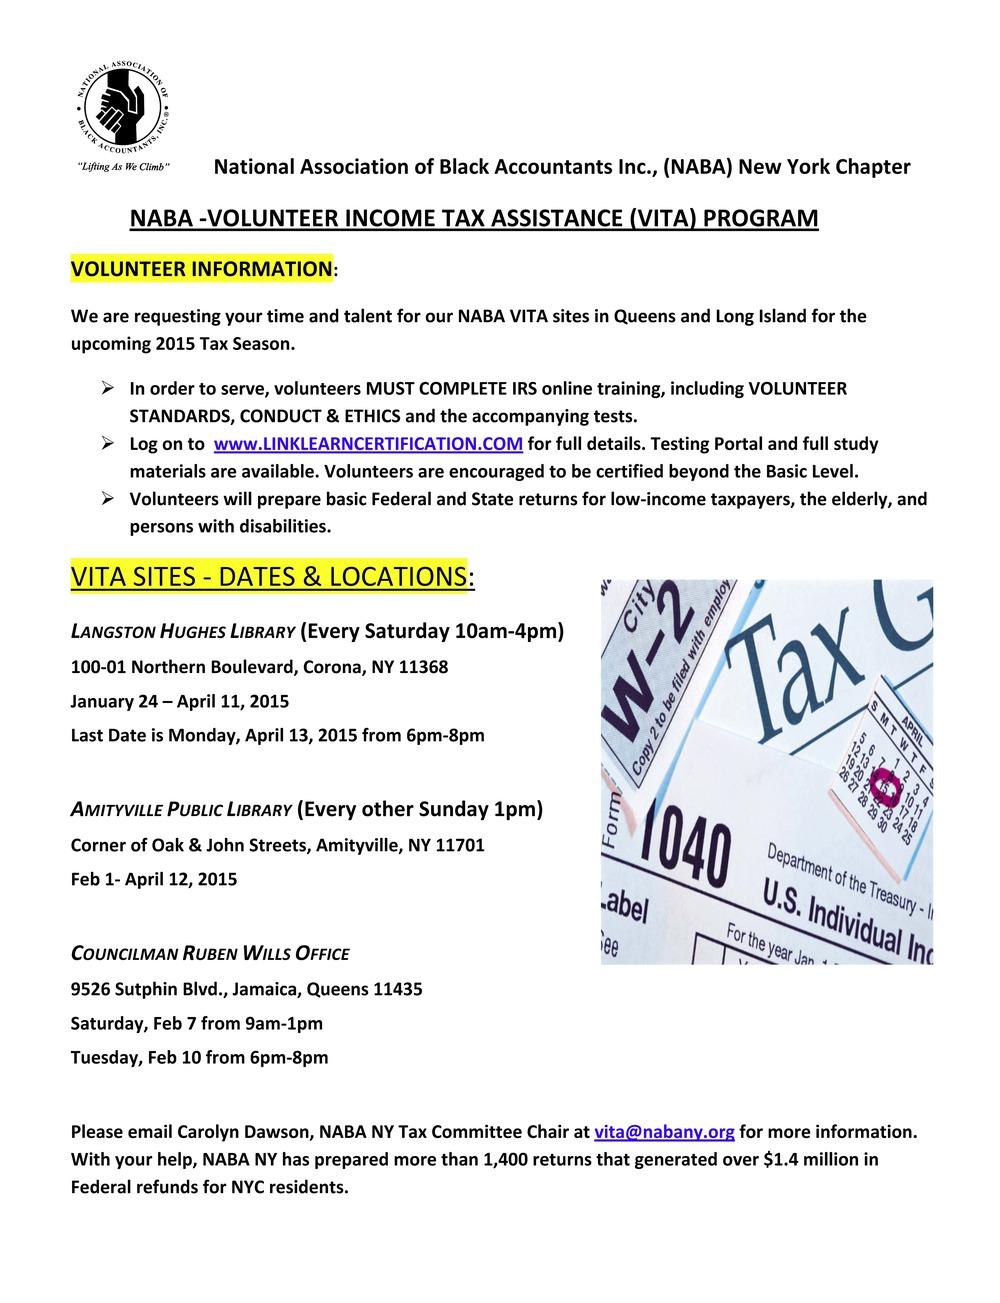 Naba volunteer income tax assistance vita program naba ny naba volunteer income tax assistance vita program 1betcityfo Choice Image